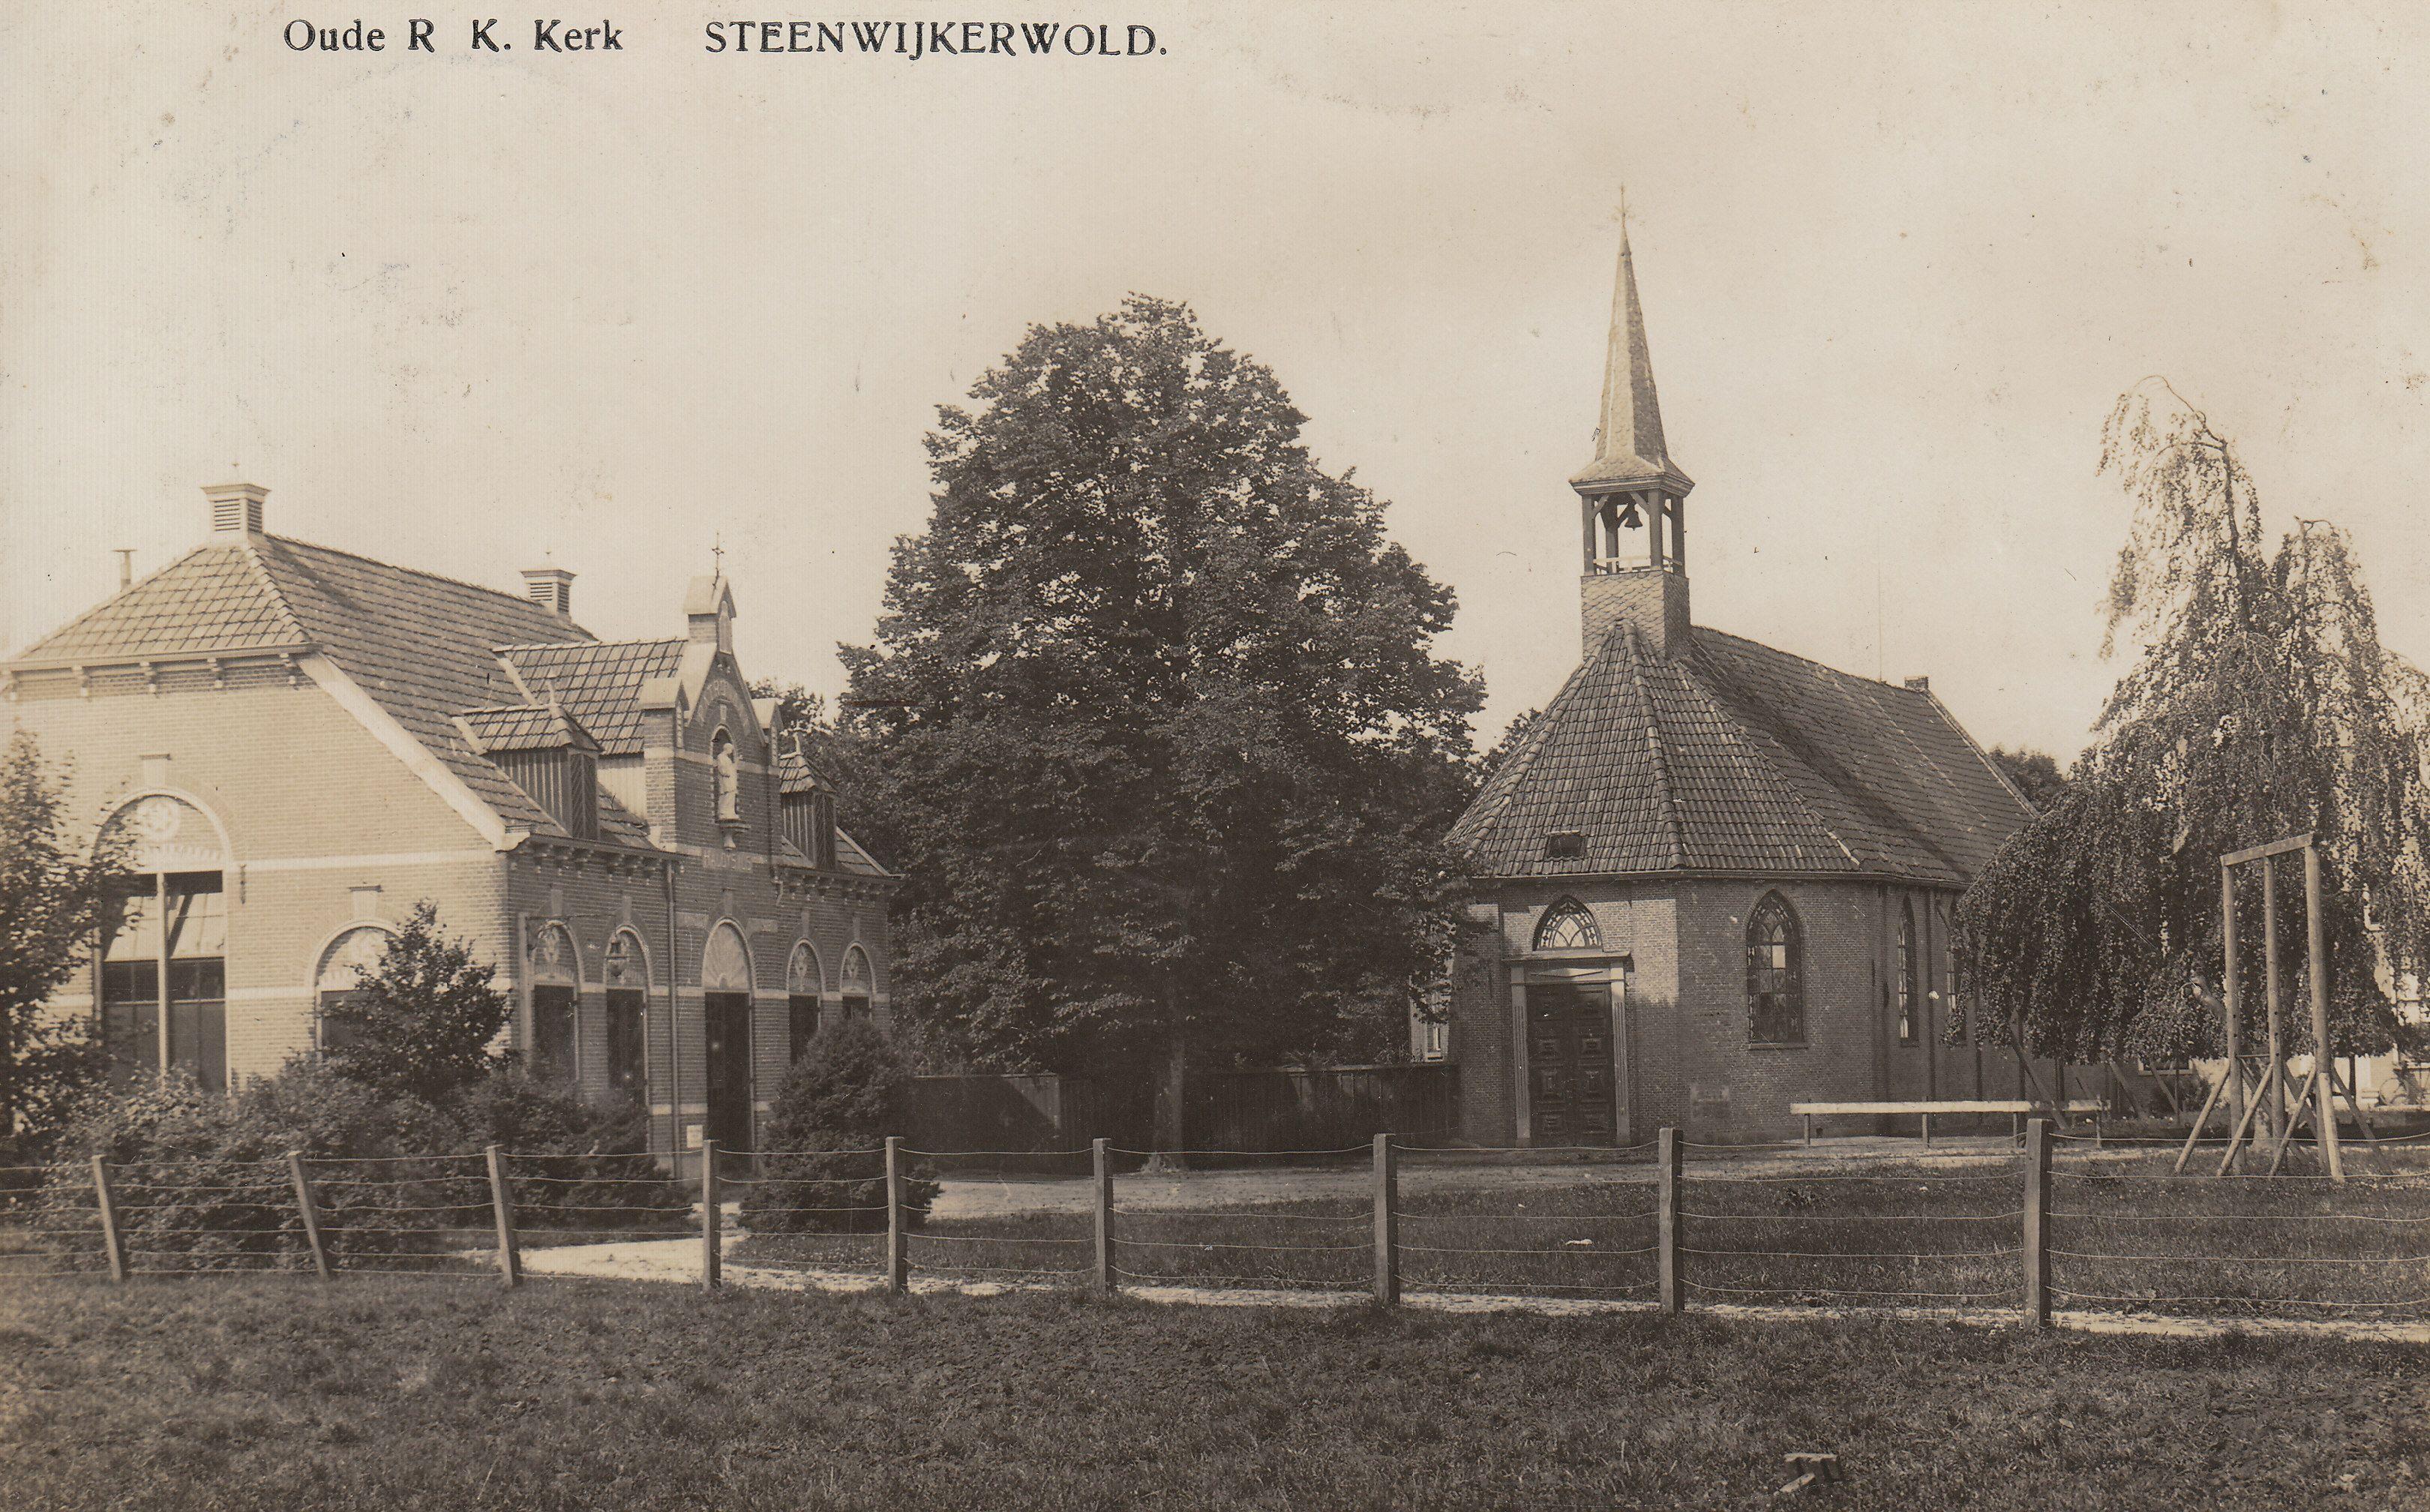 Steenwijkerwold - Oude R.K. Kerk